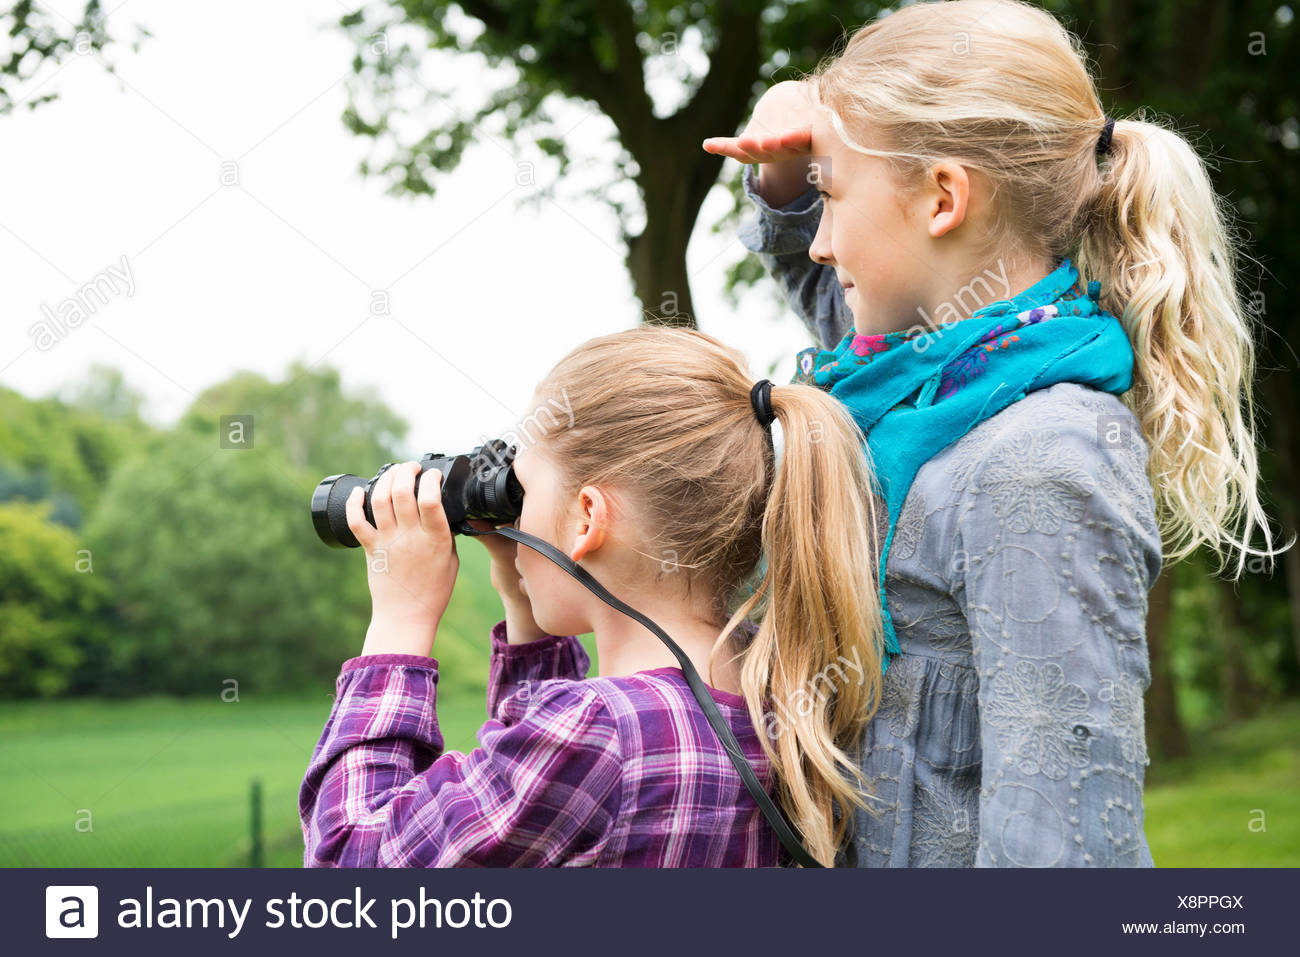 Two sisters using binoculars - Stock Image